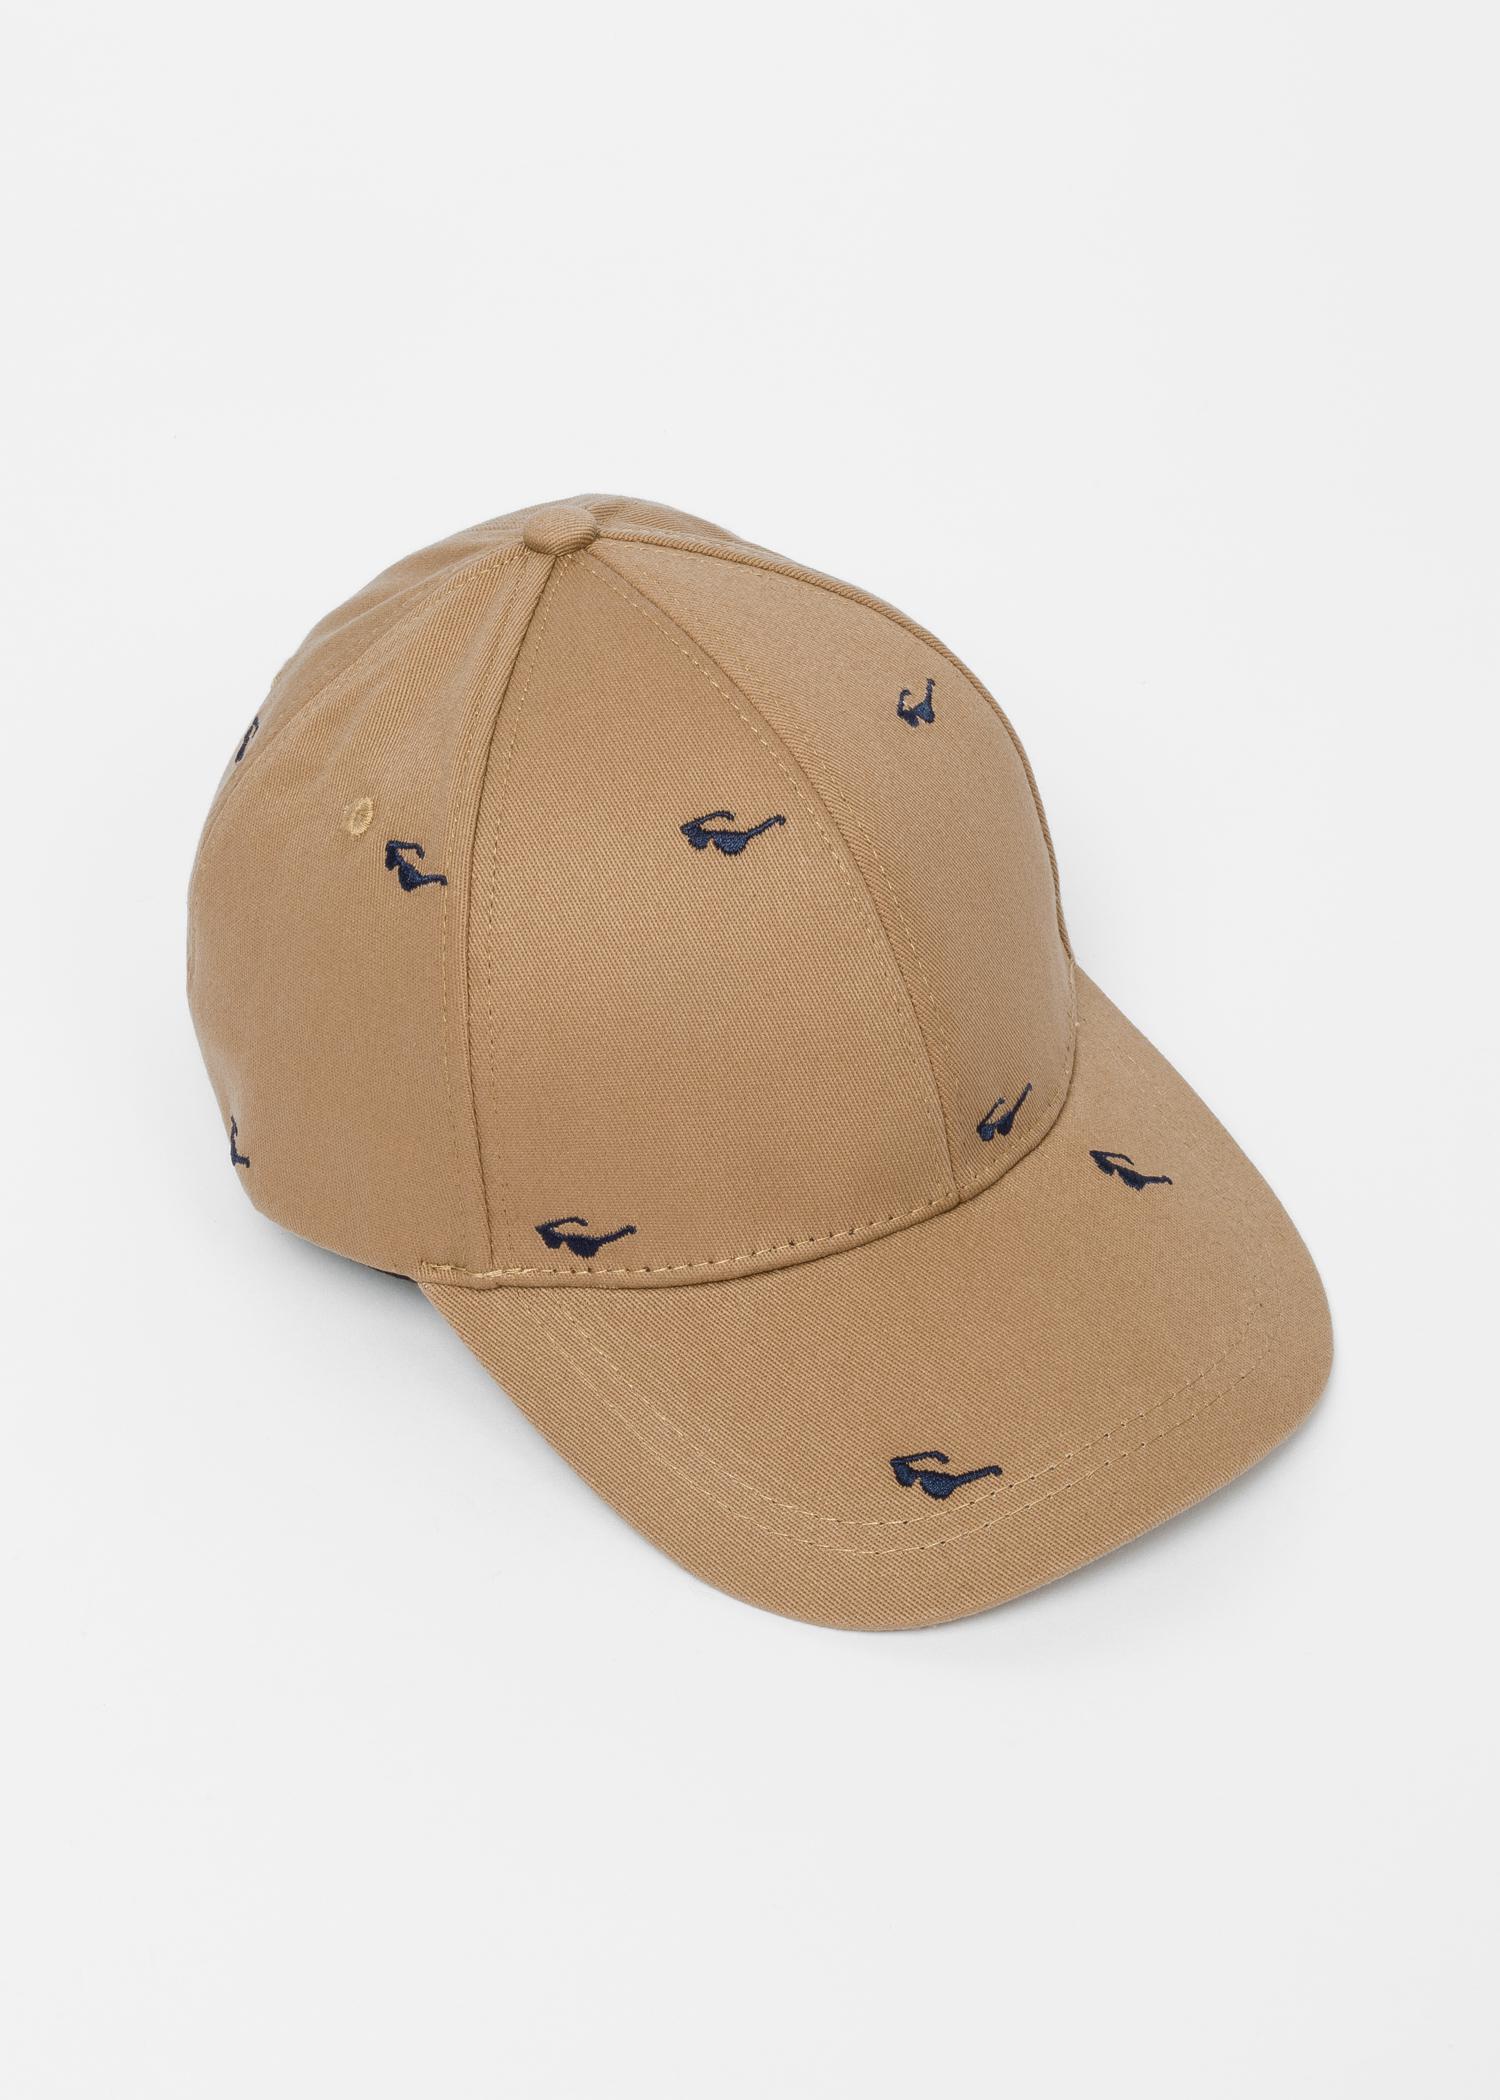 9637178cbd6 Paul Smith Camel Embroidered  Sunglasses  Motif Cotton Baseball Cap ...